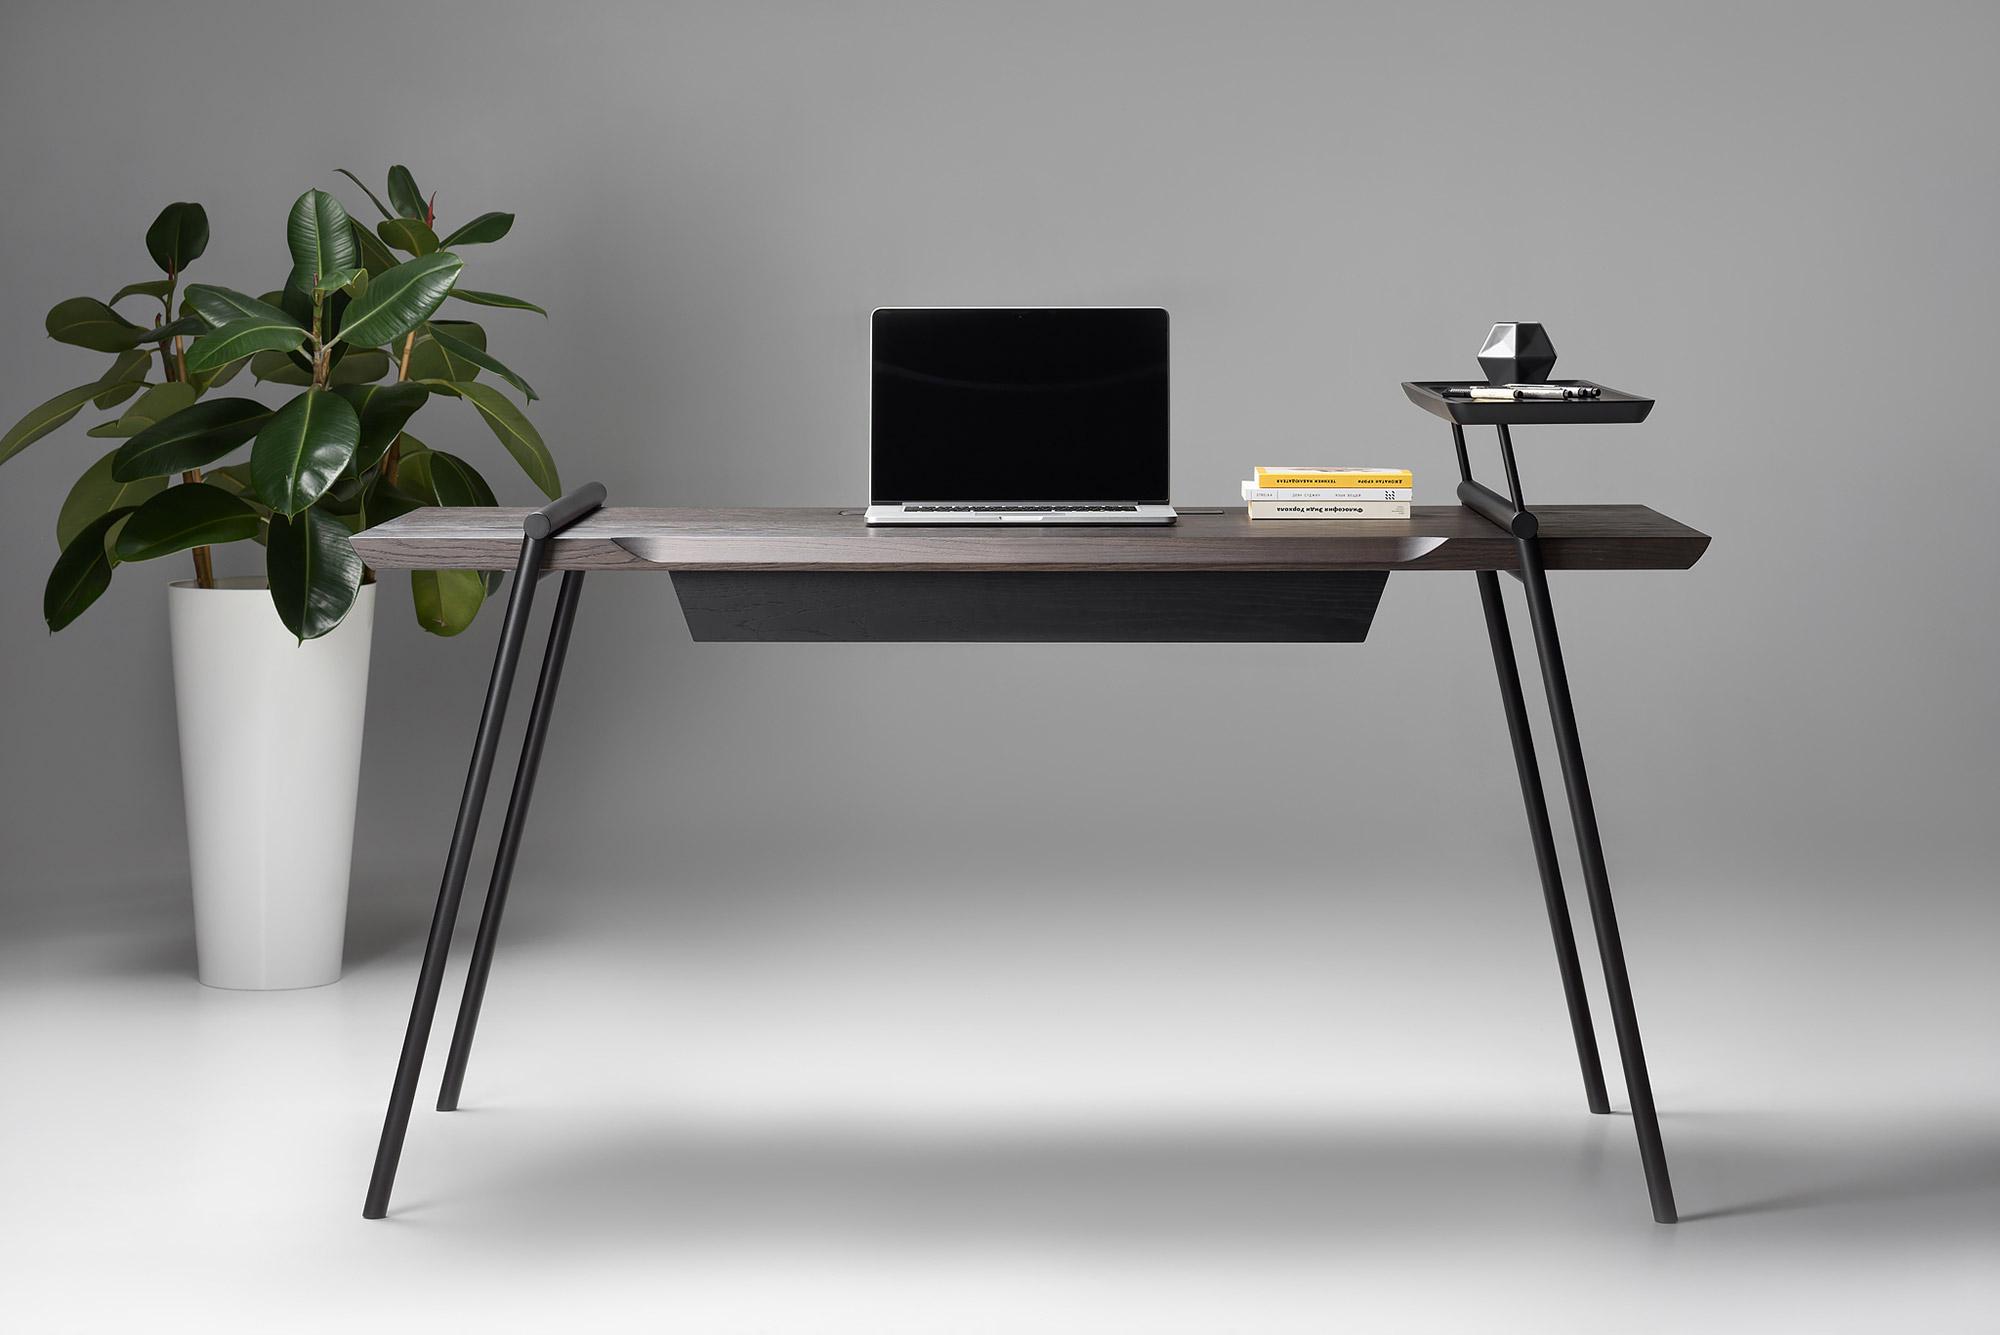 The DUOO Writing Desk